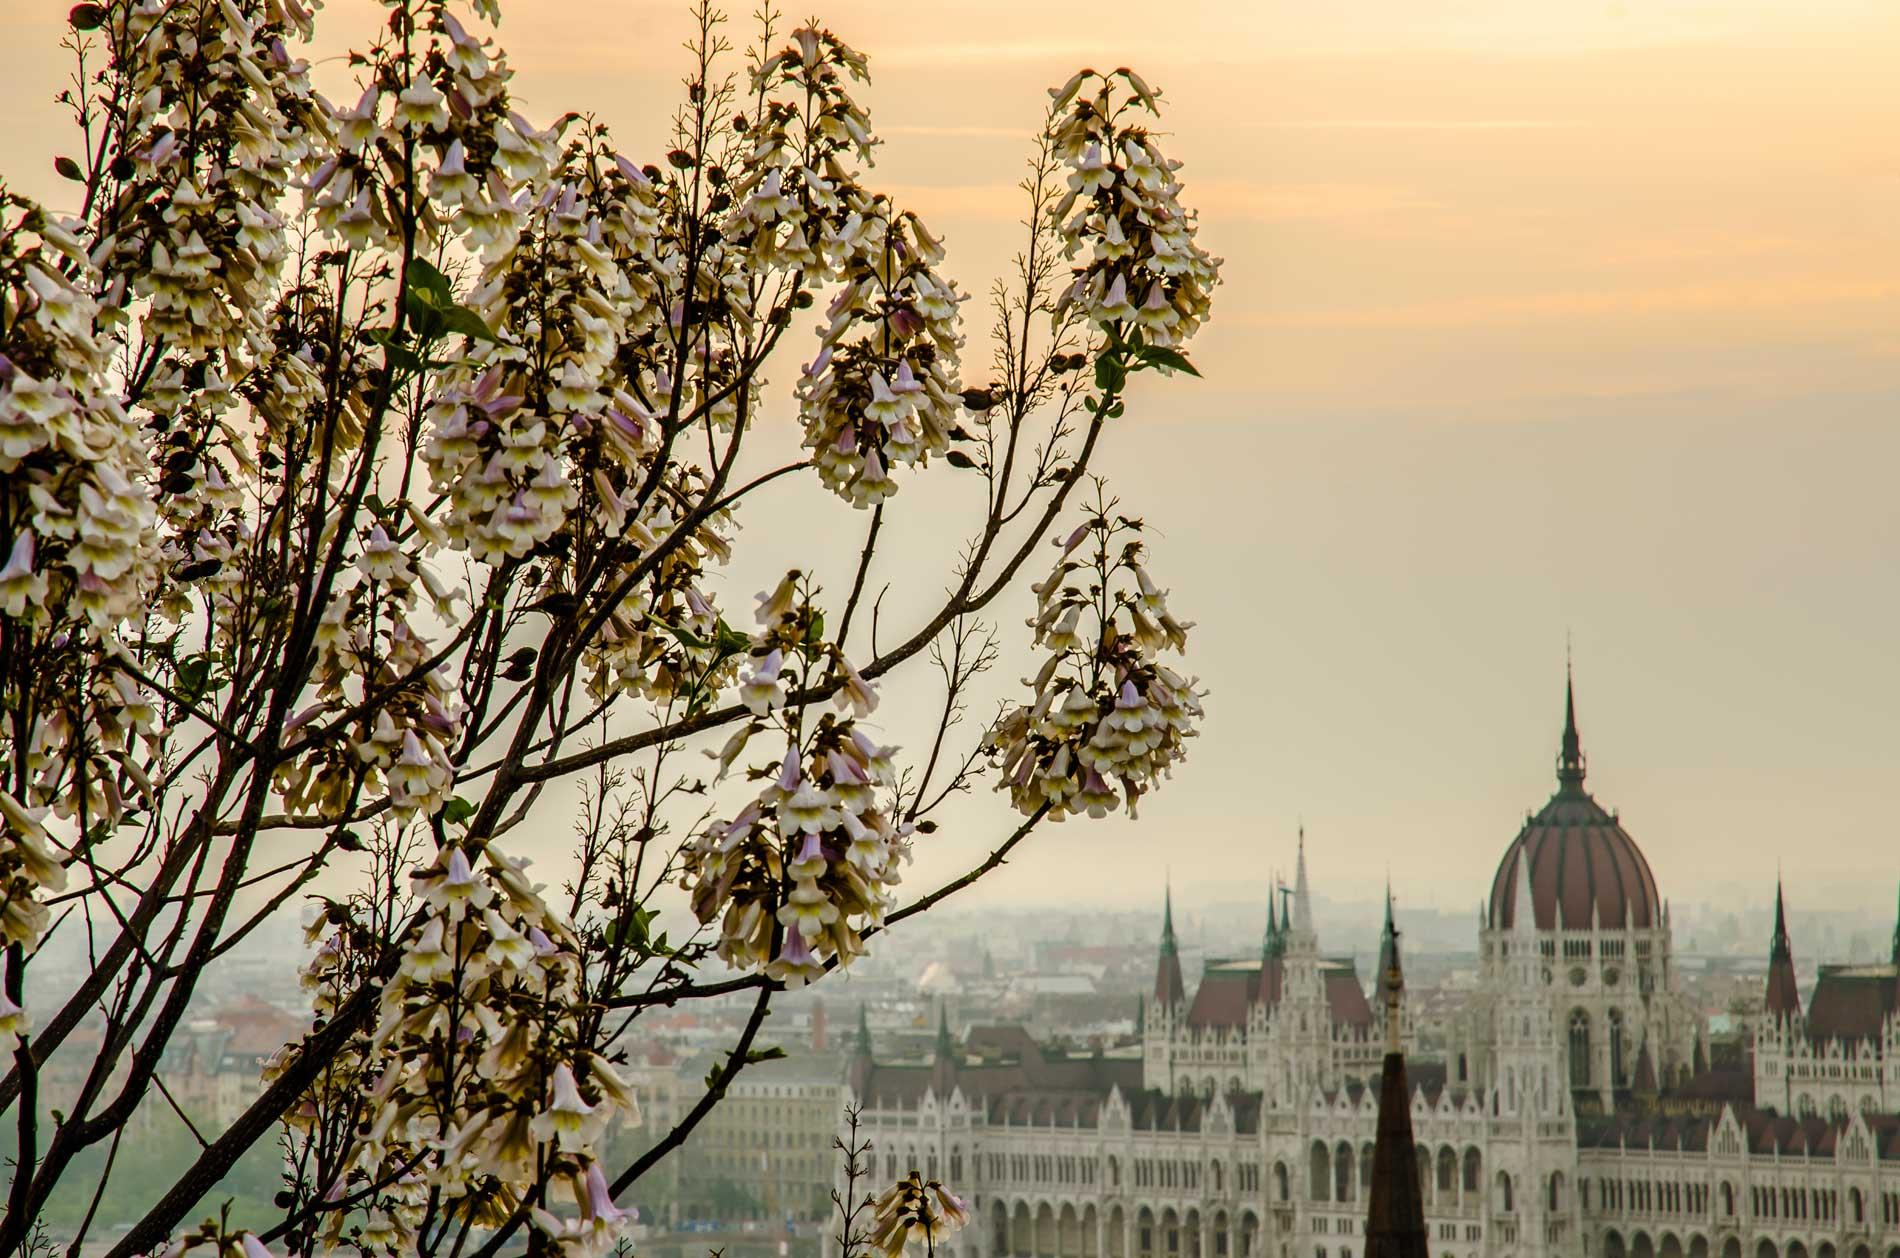 photography_atthary_budapest_monumental_34